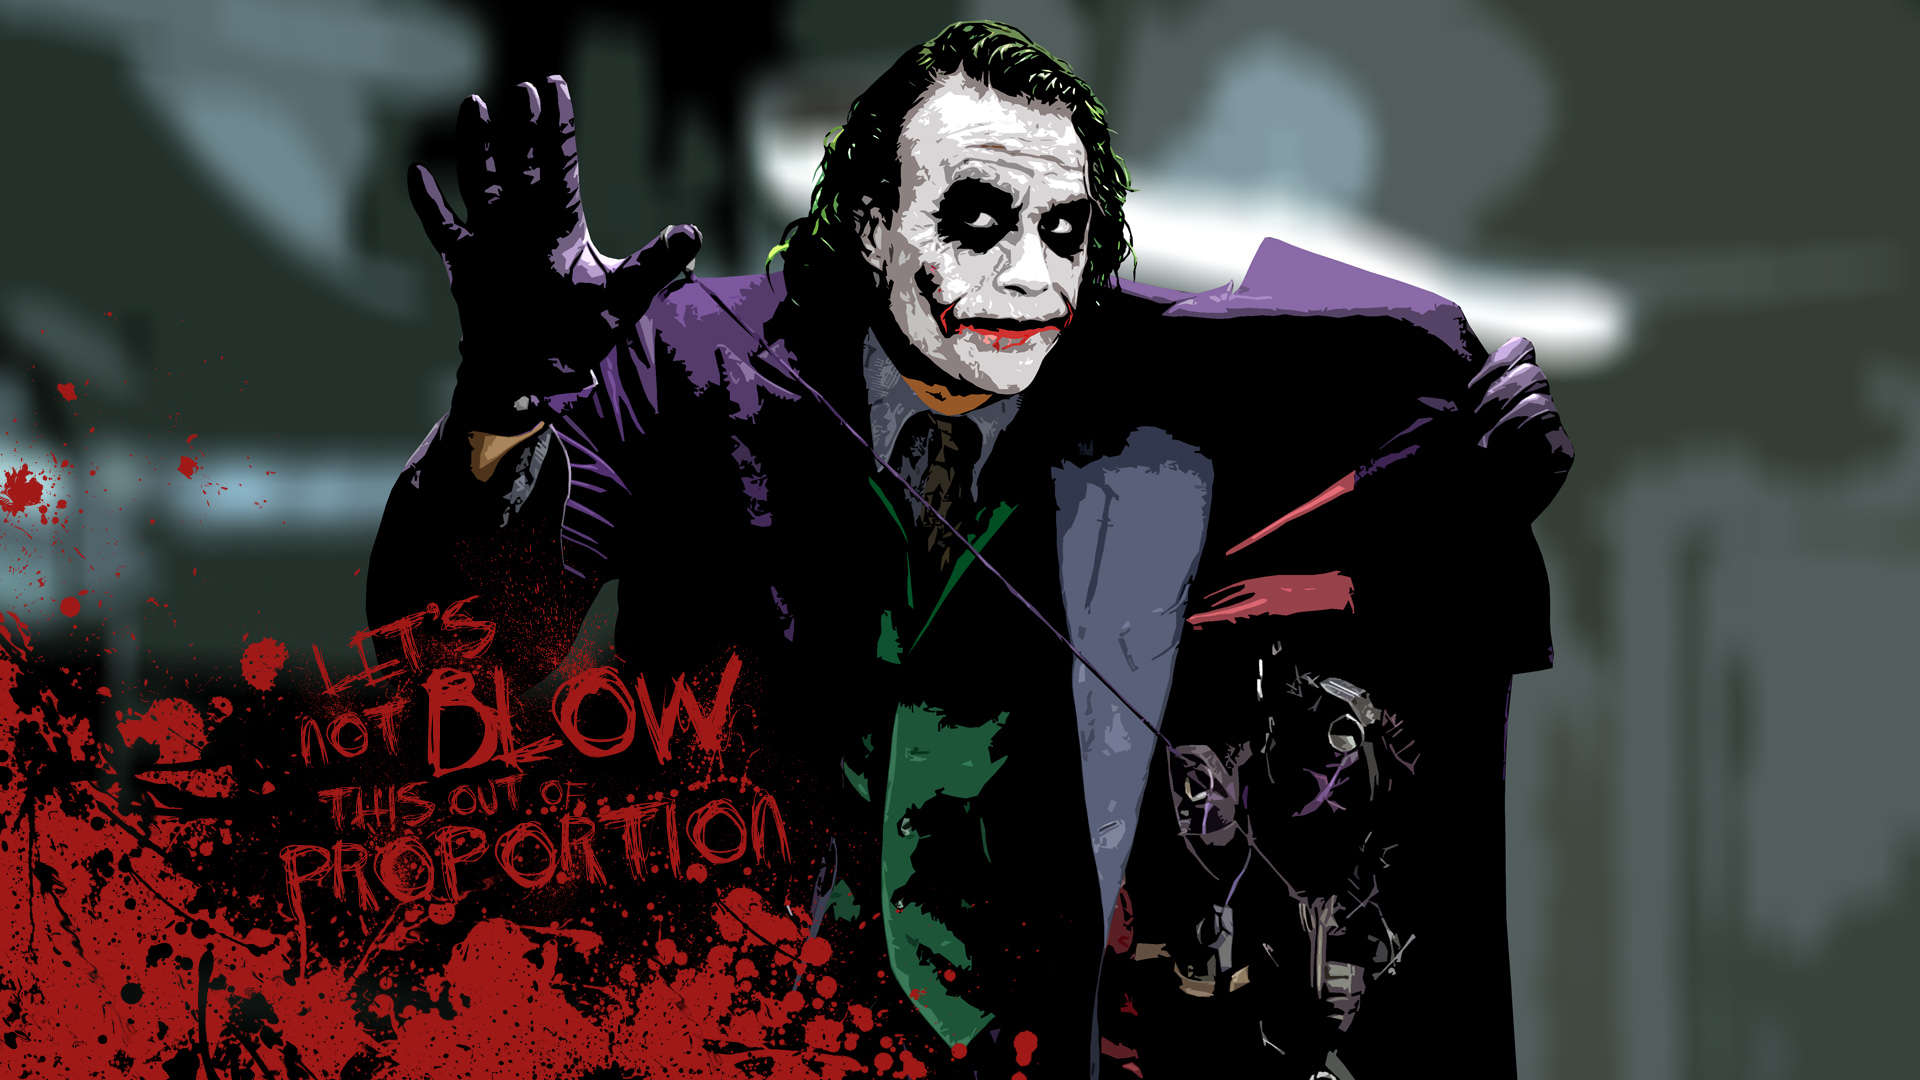 joker   The Joker Wallpaper 28092794   Page 8 1920x1080